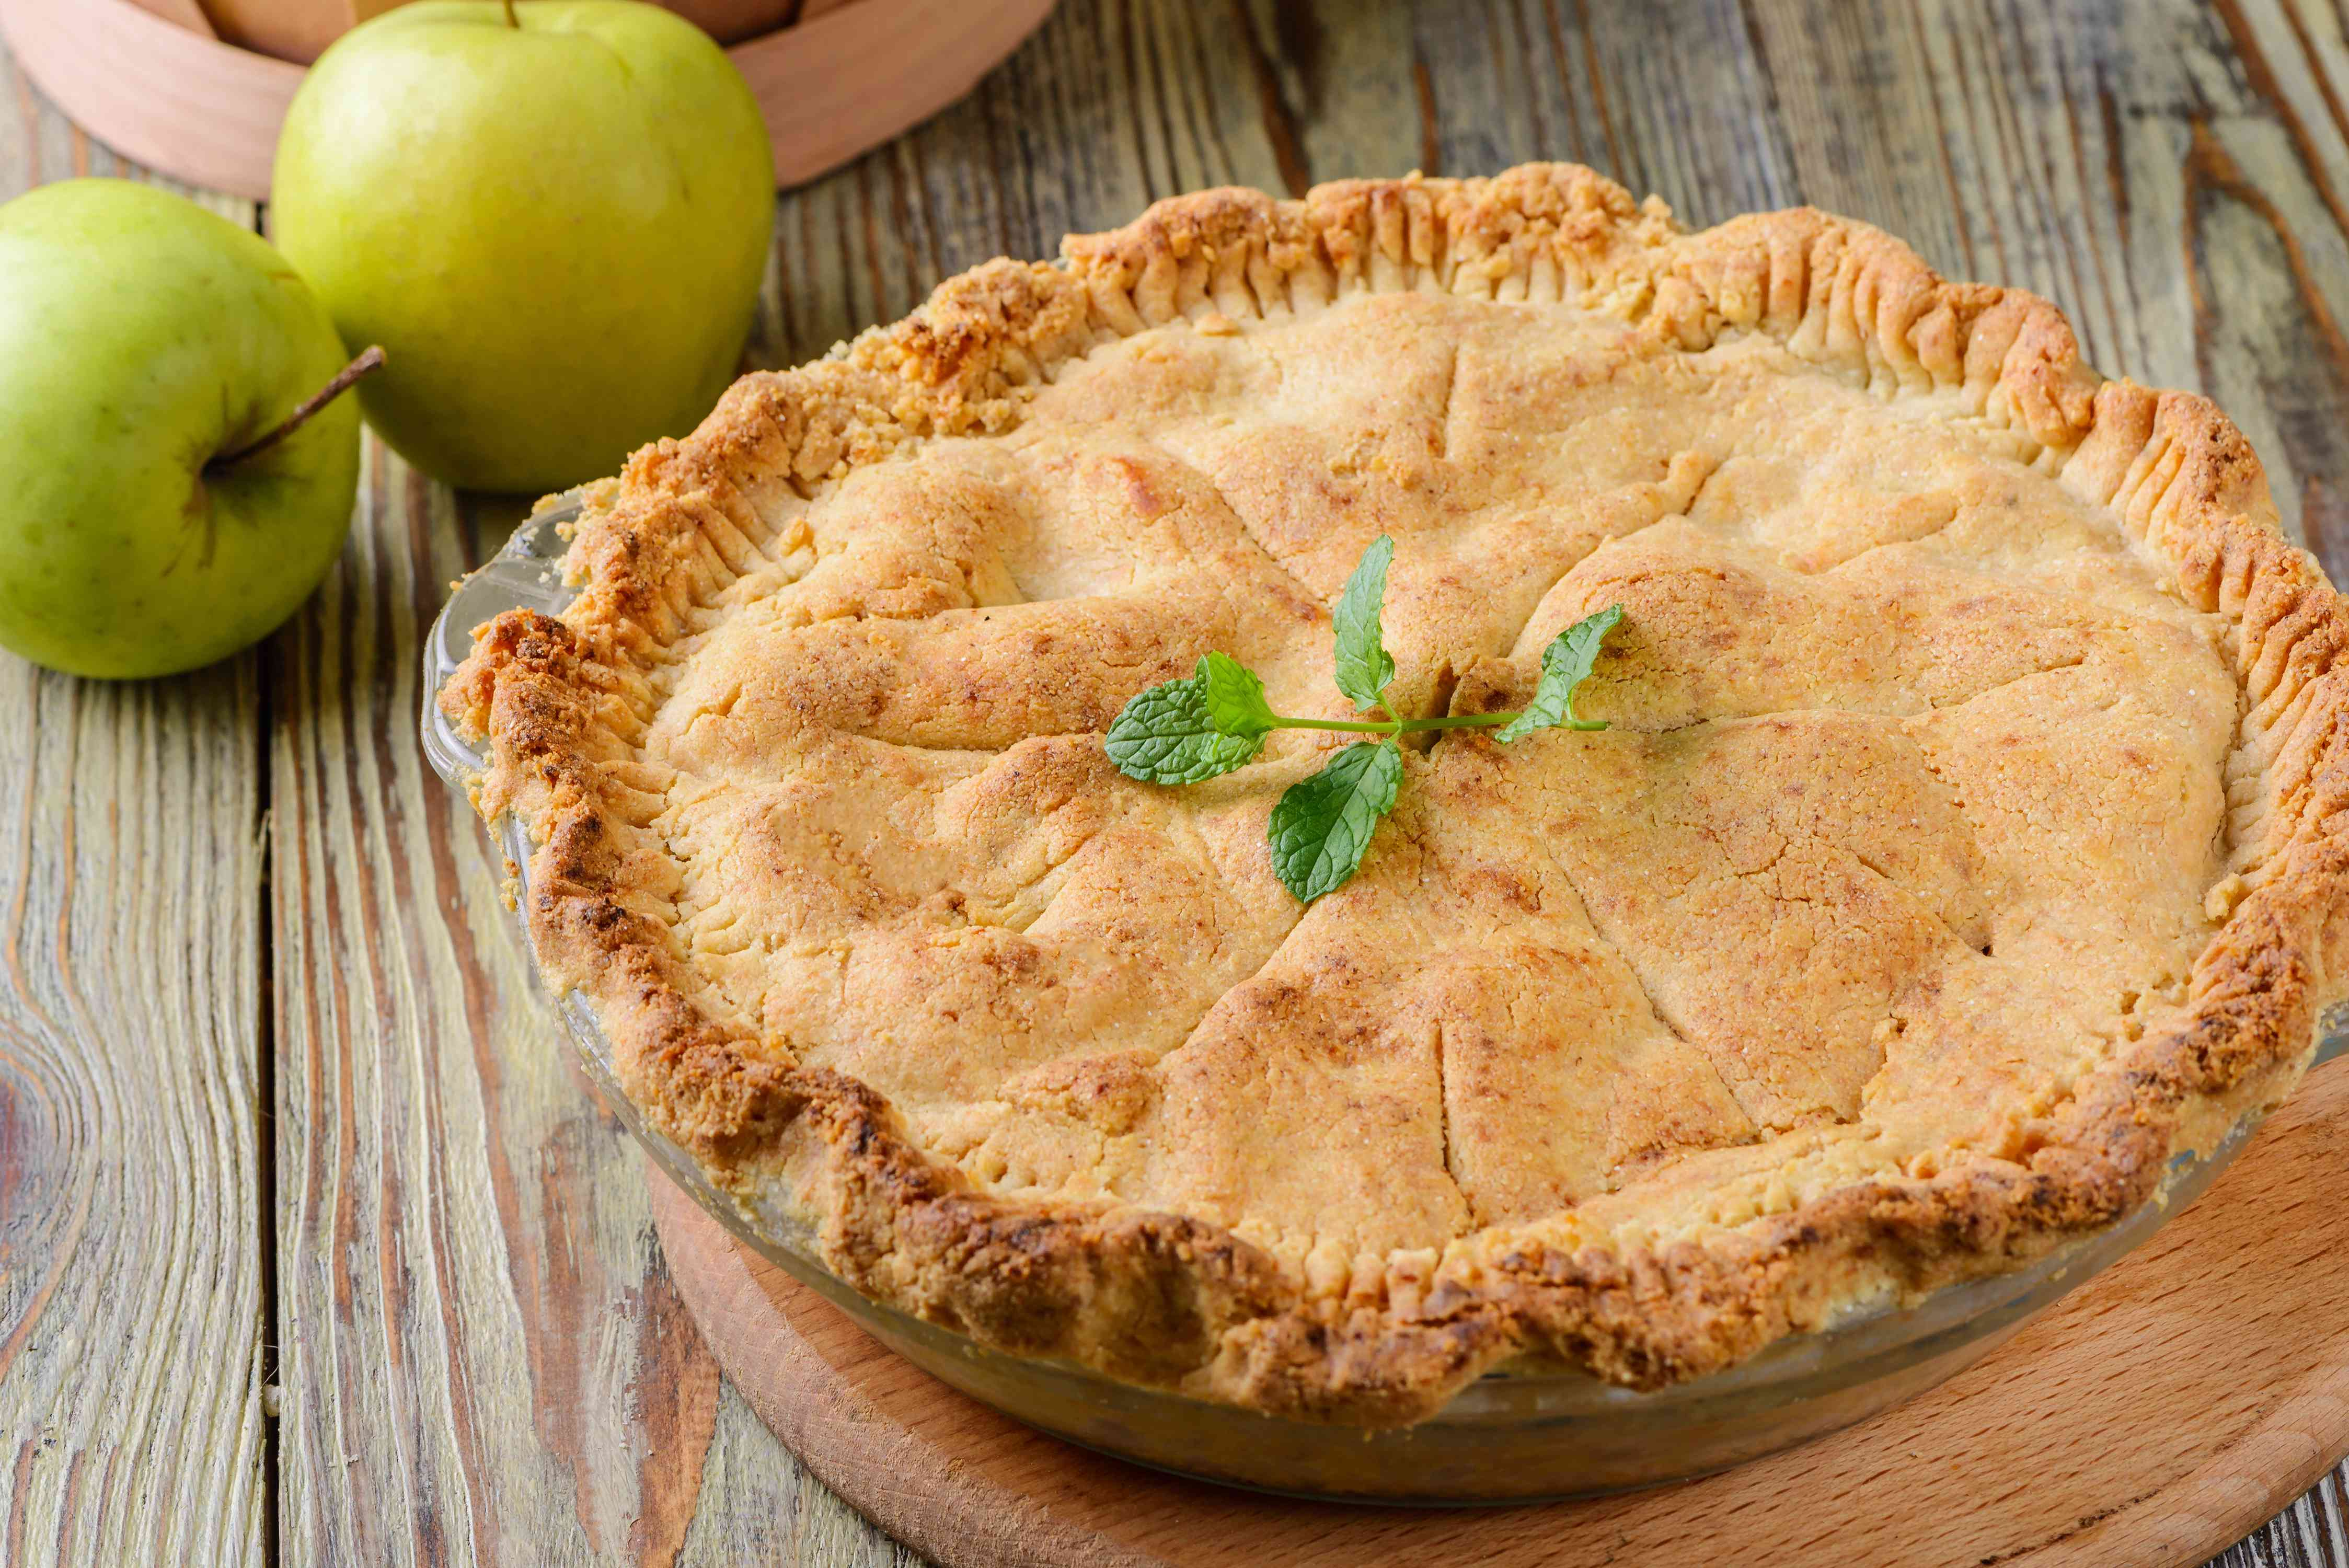 Old fashioned gluten free apple pie recipe